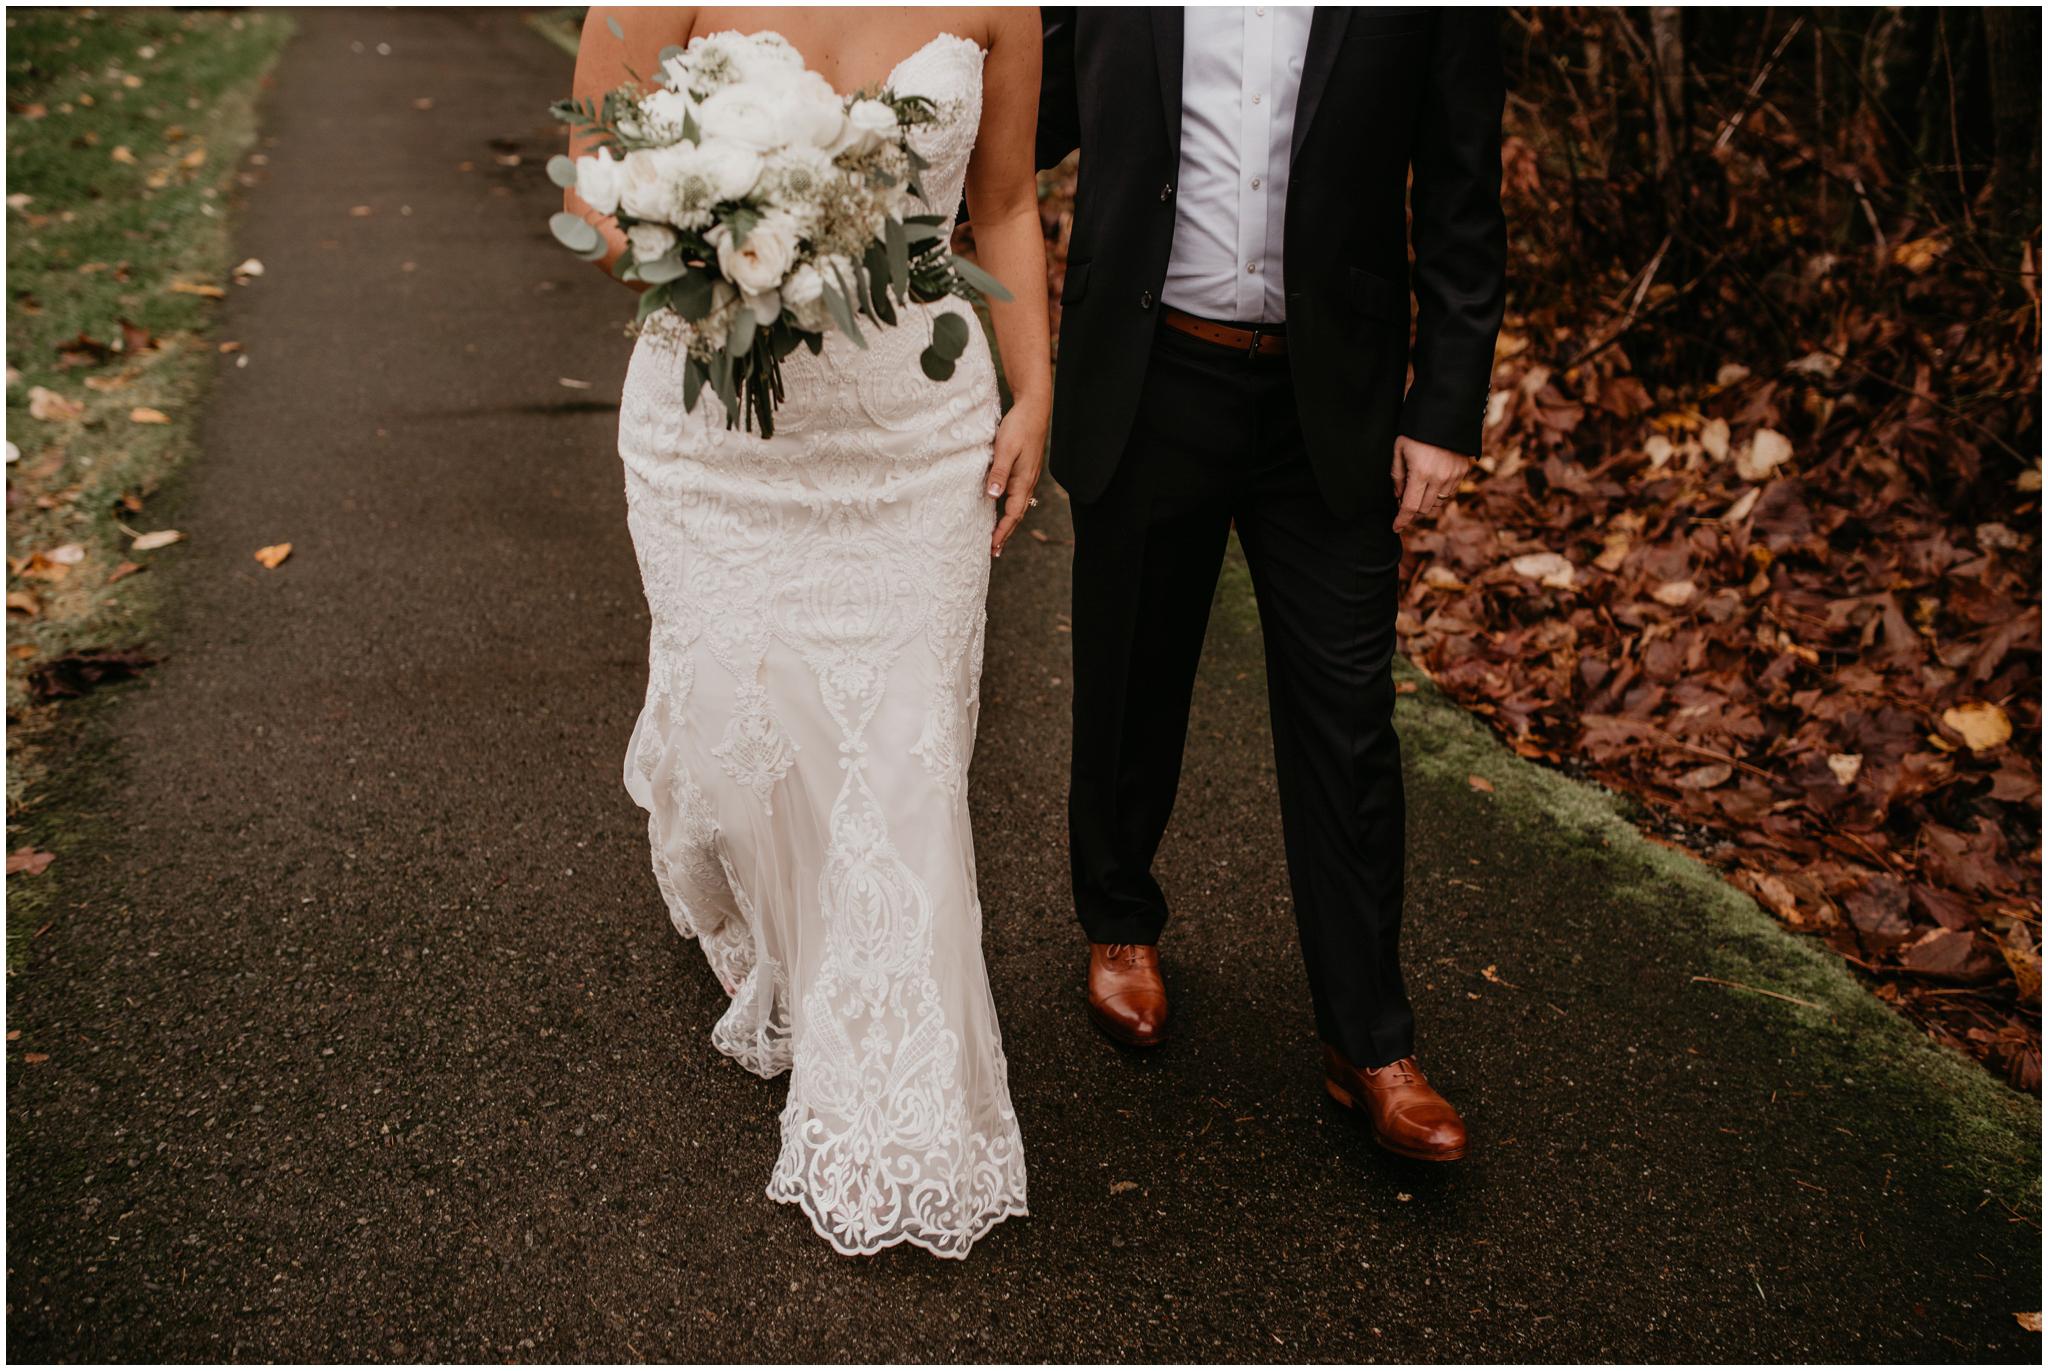 ashley-tj-the-pickering-barn-winter-wedding-seattle-photographer-042.jpg